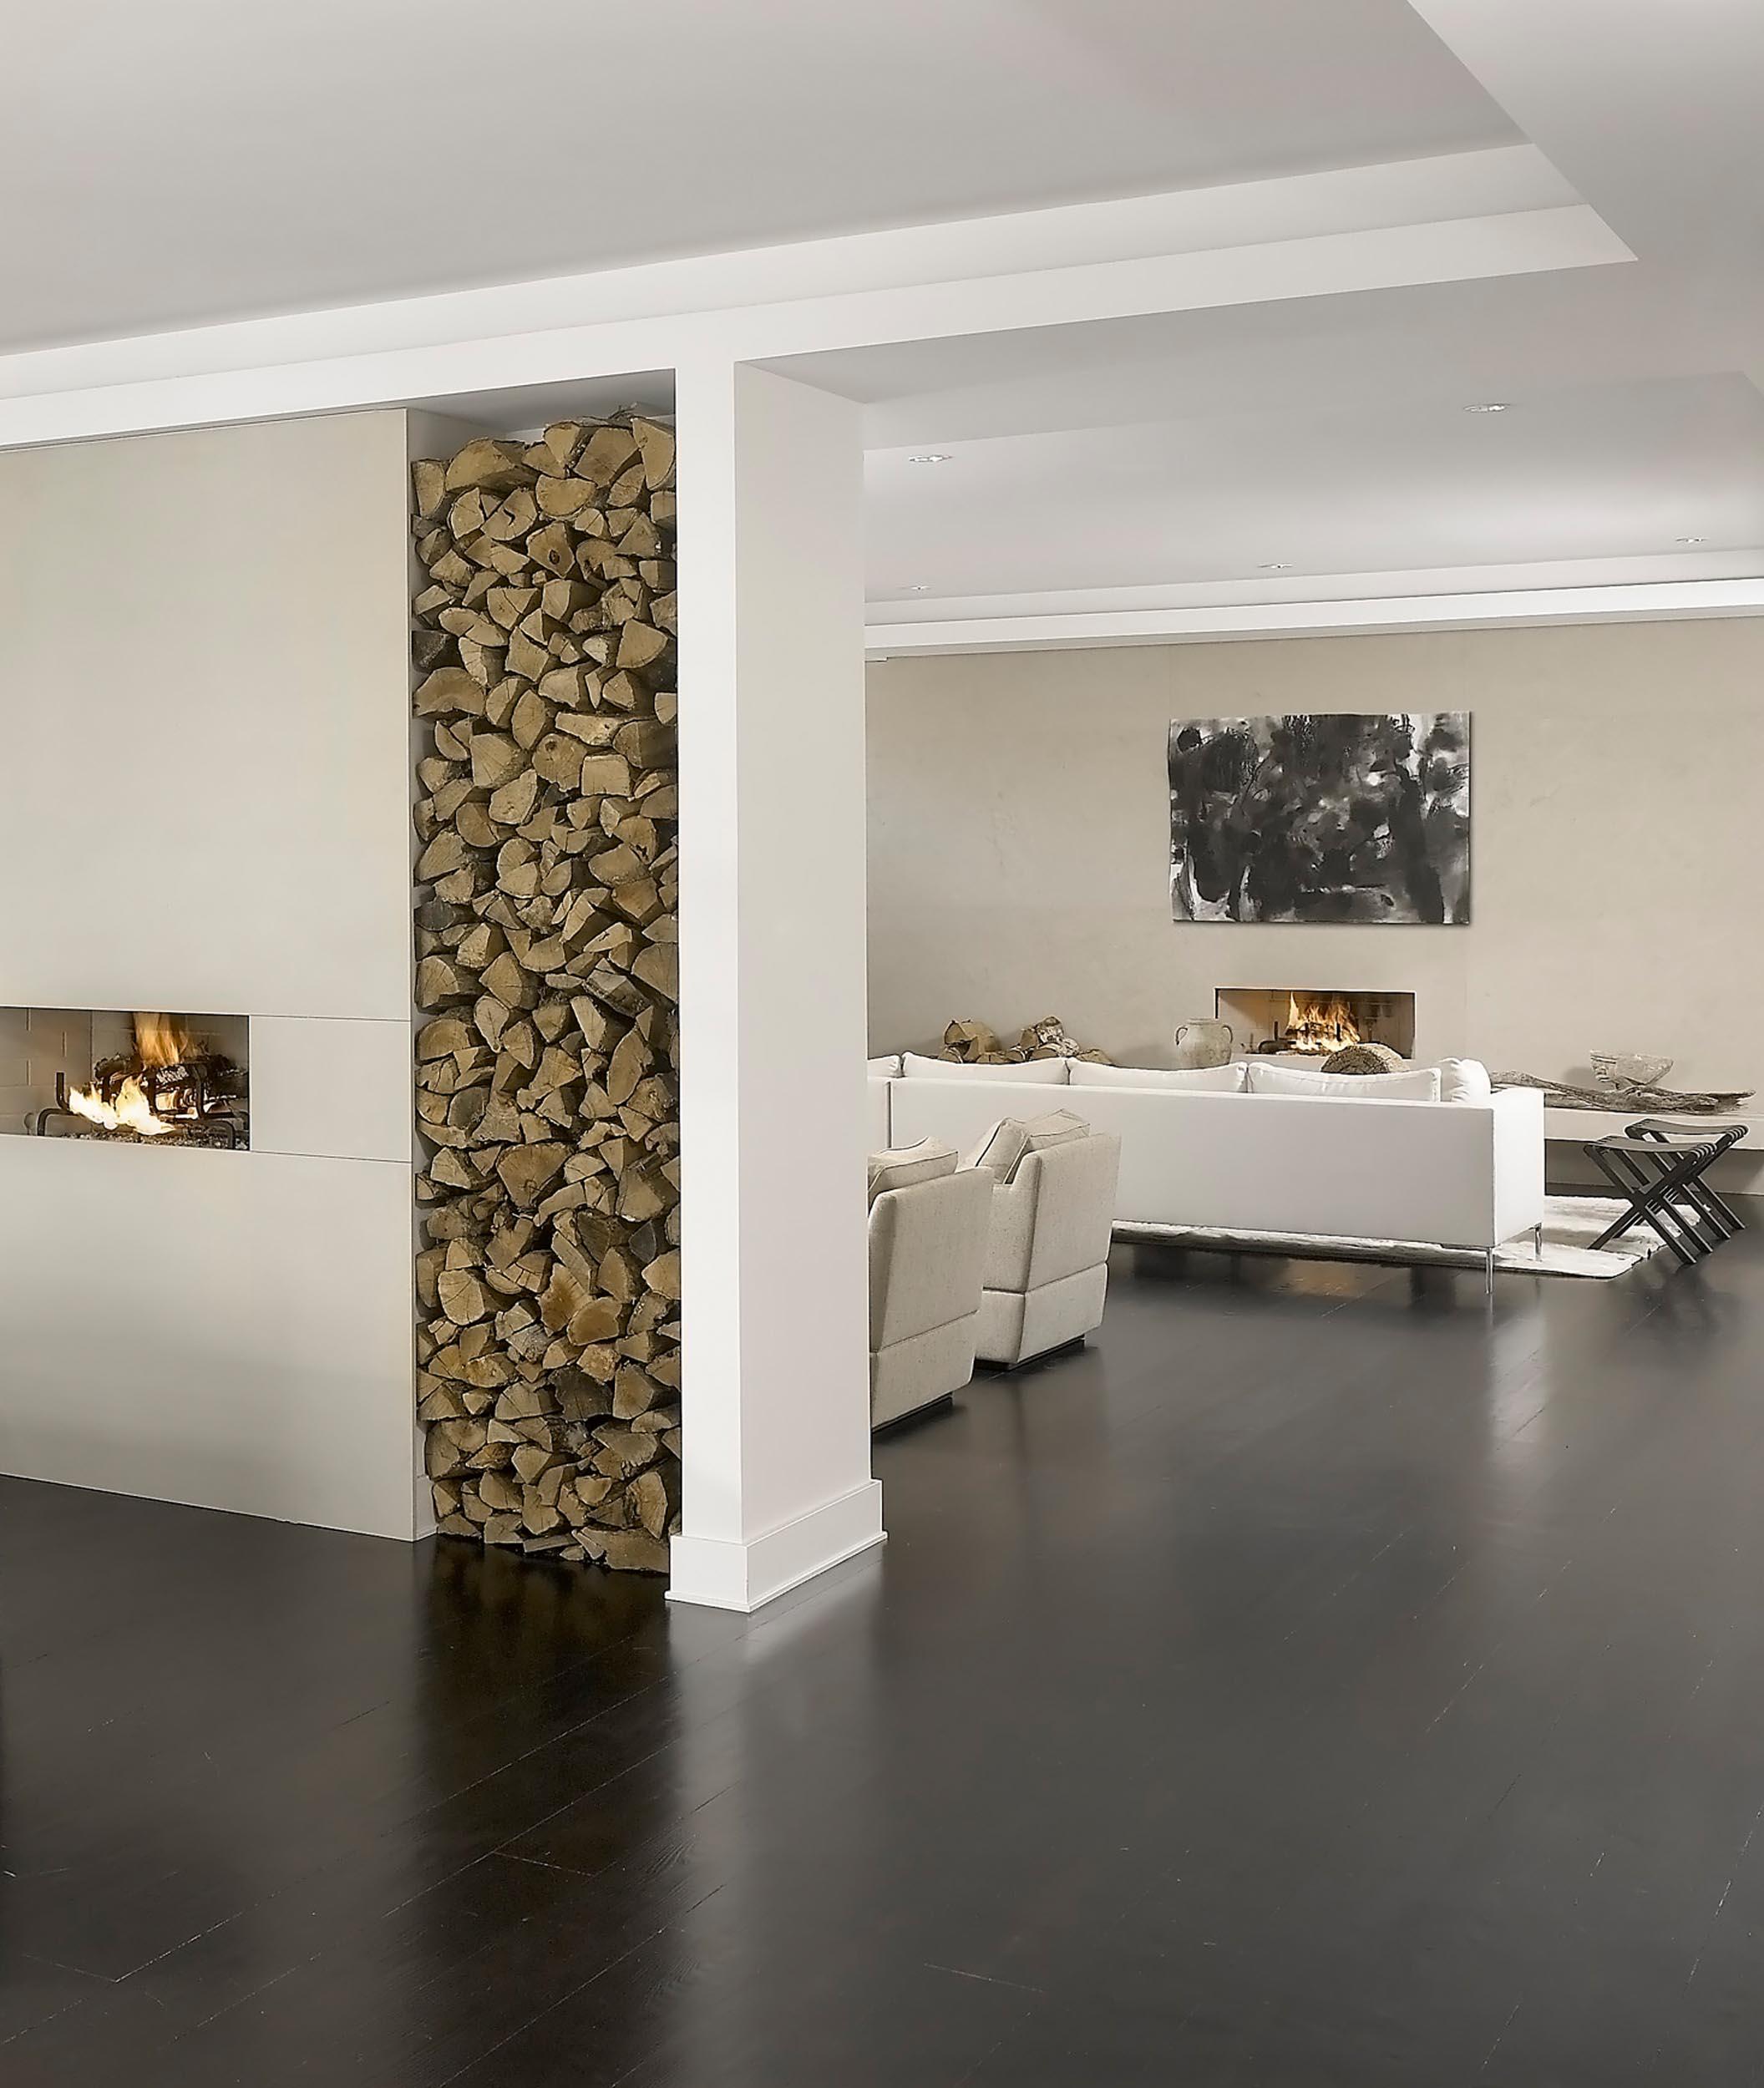 Leo_Designs_Chicago_interior_design_contemporary_inspired_nail_factory_conversion2.jpg